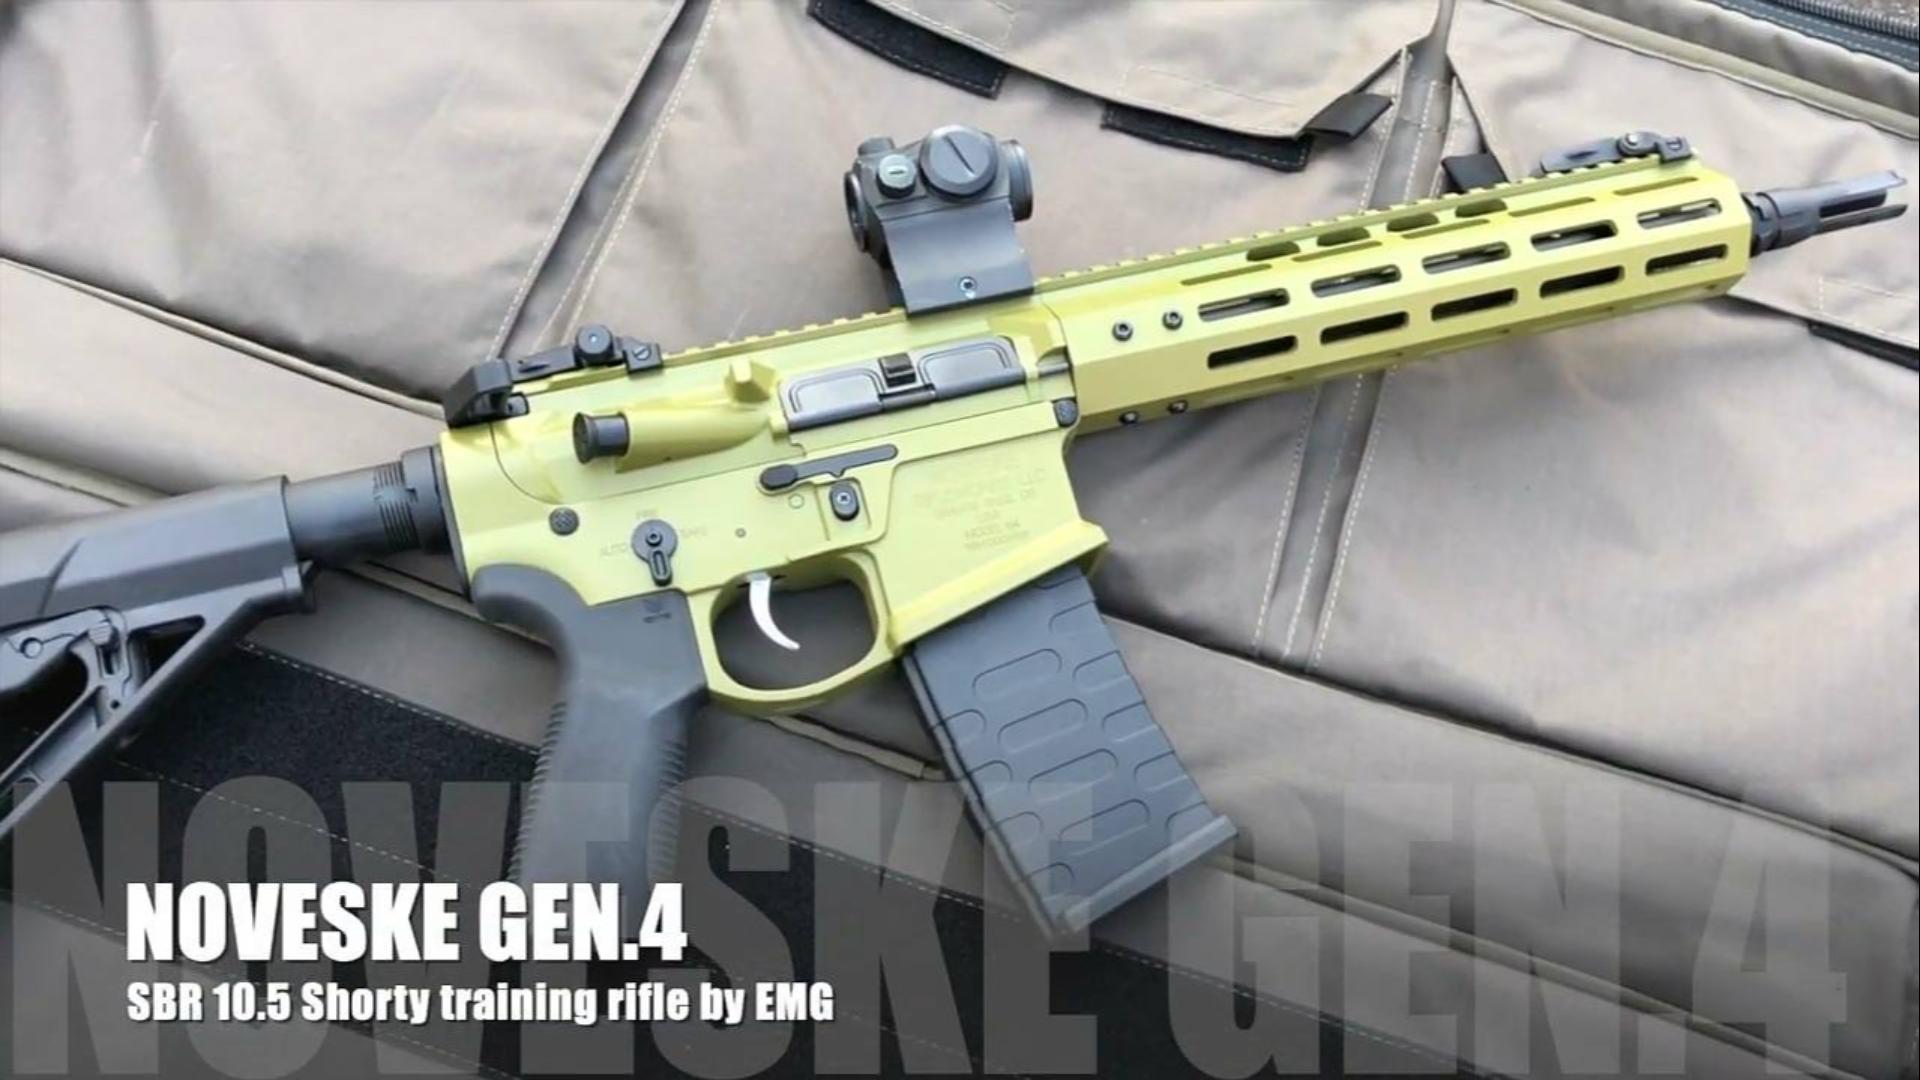 EMG Noveske SBR 10.5 shorty rifle